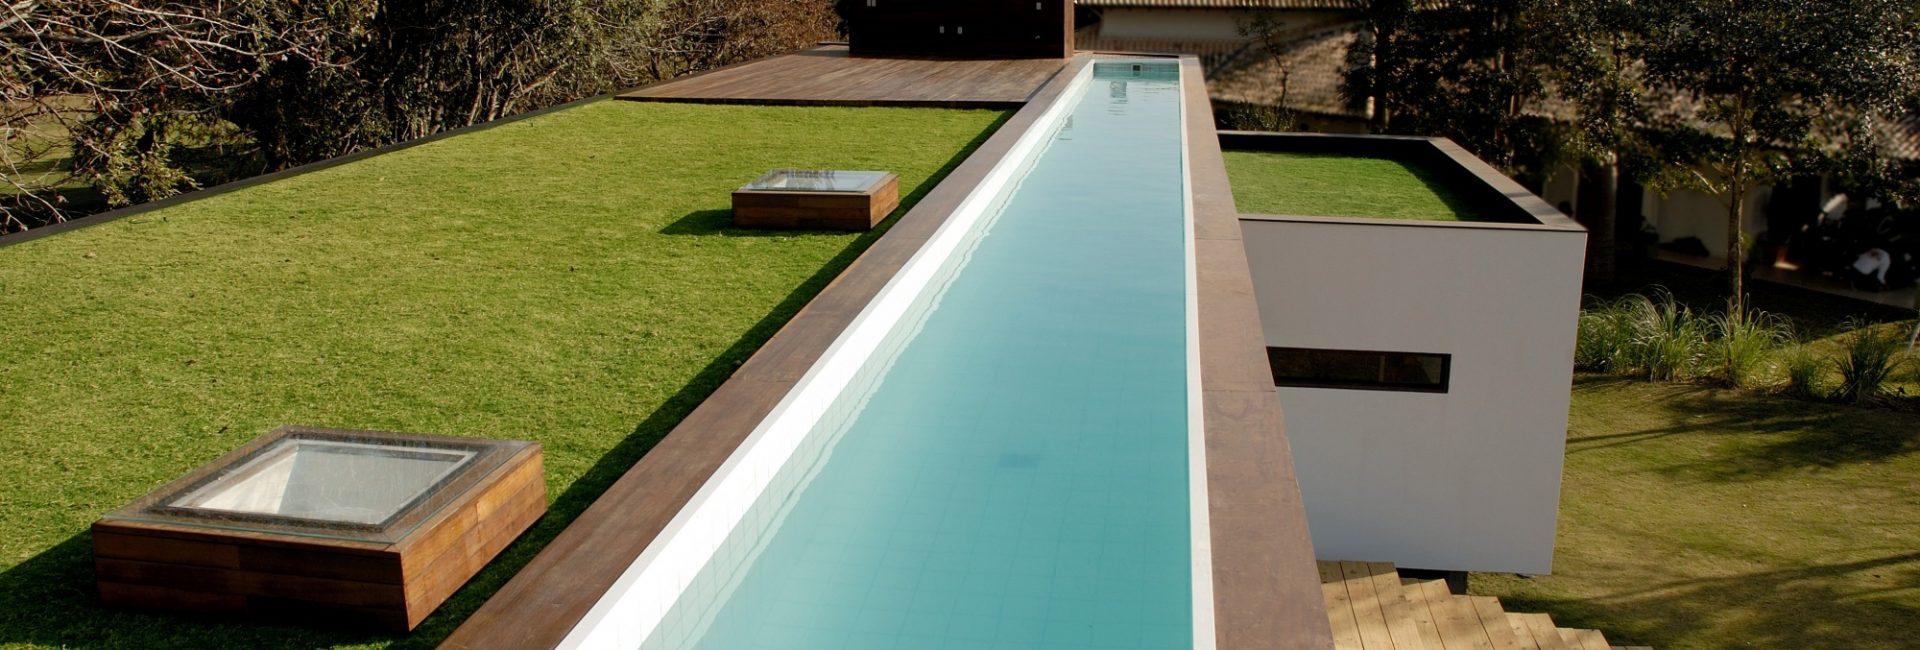 telhado verde laminar